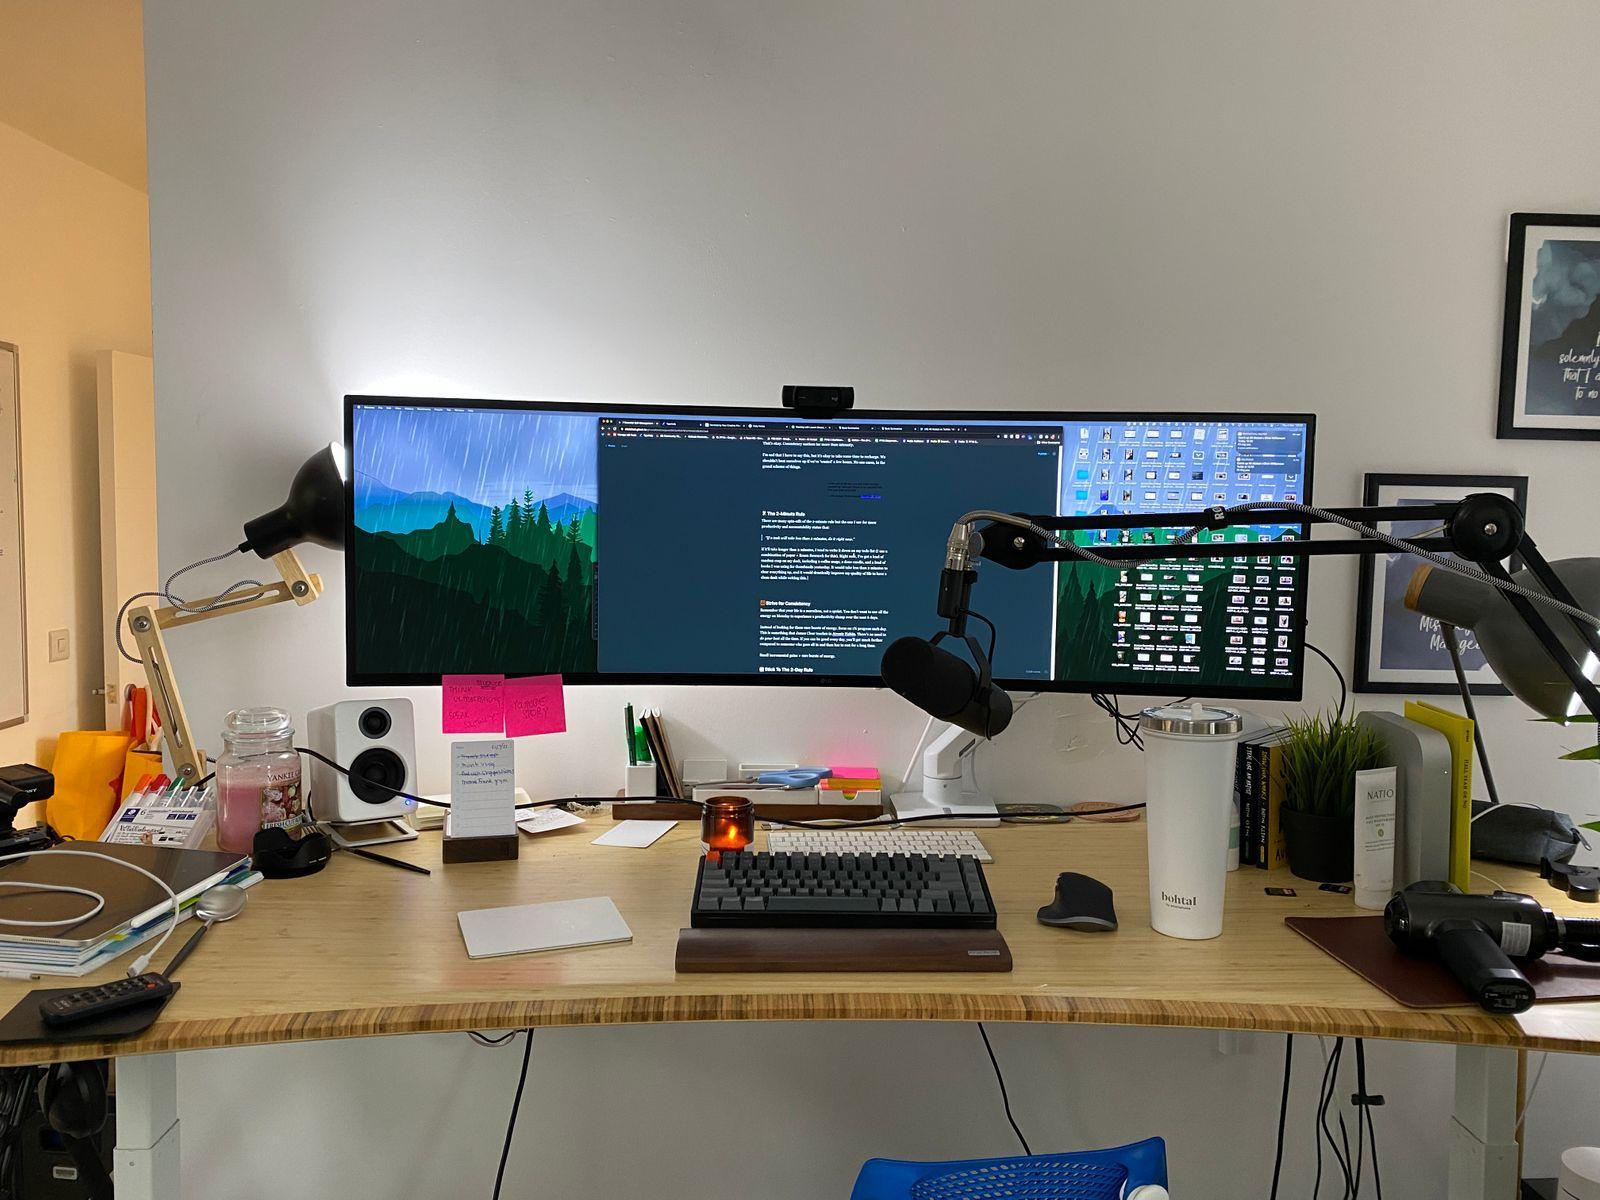 My a little bit less messy desk